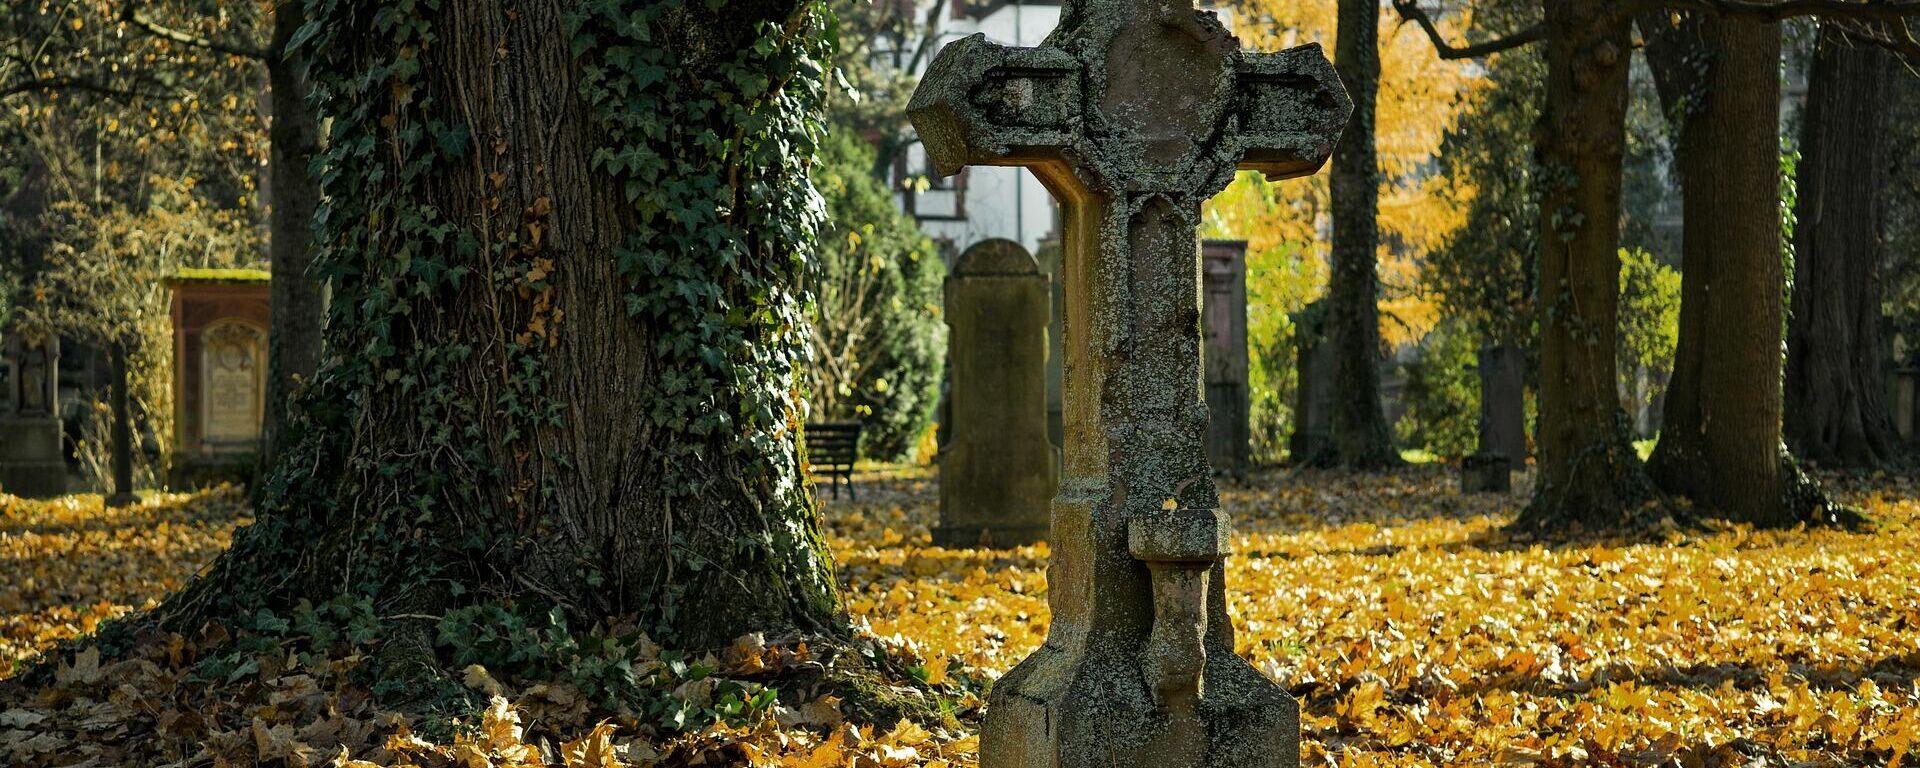 Friedhof (Symbolbild) - SNA, 1920, 27.07.2021